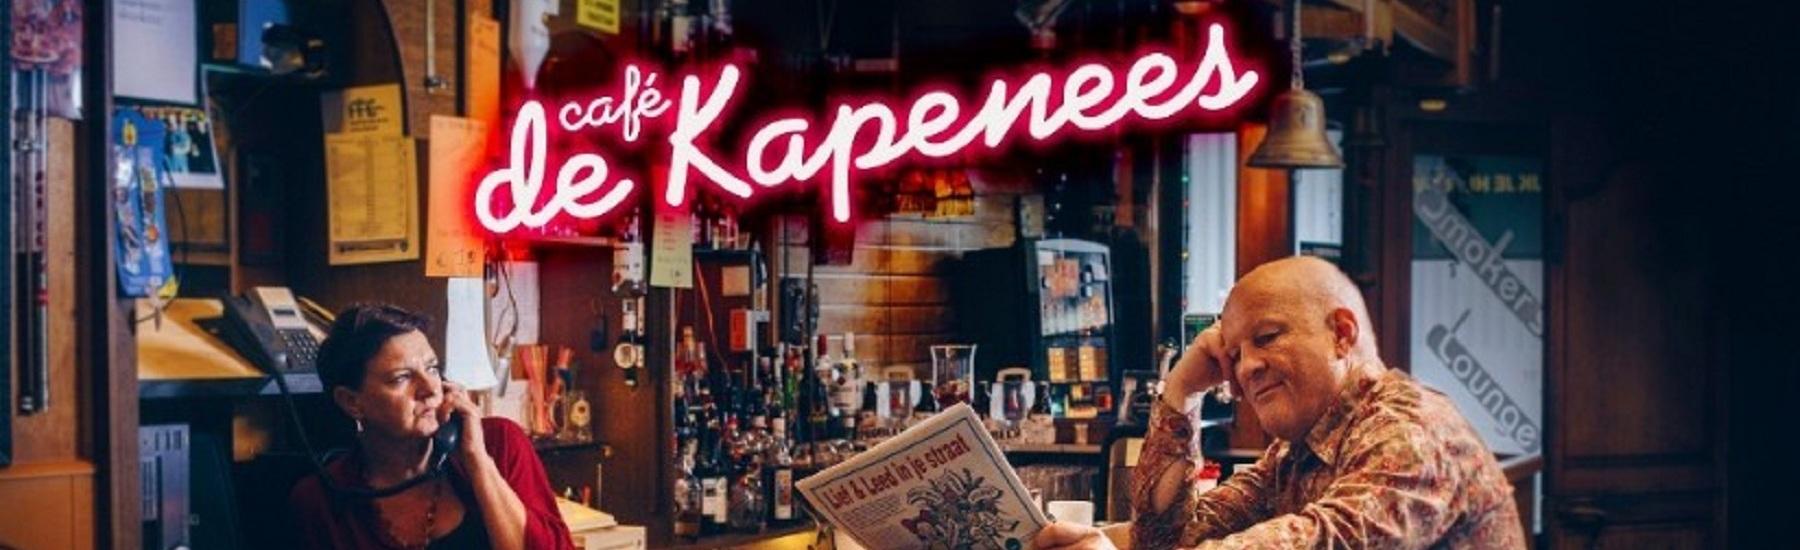 Café de Kapenees